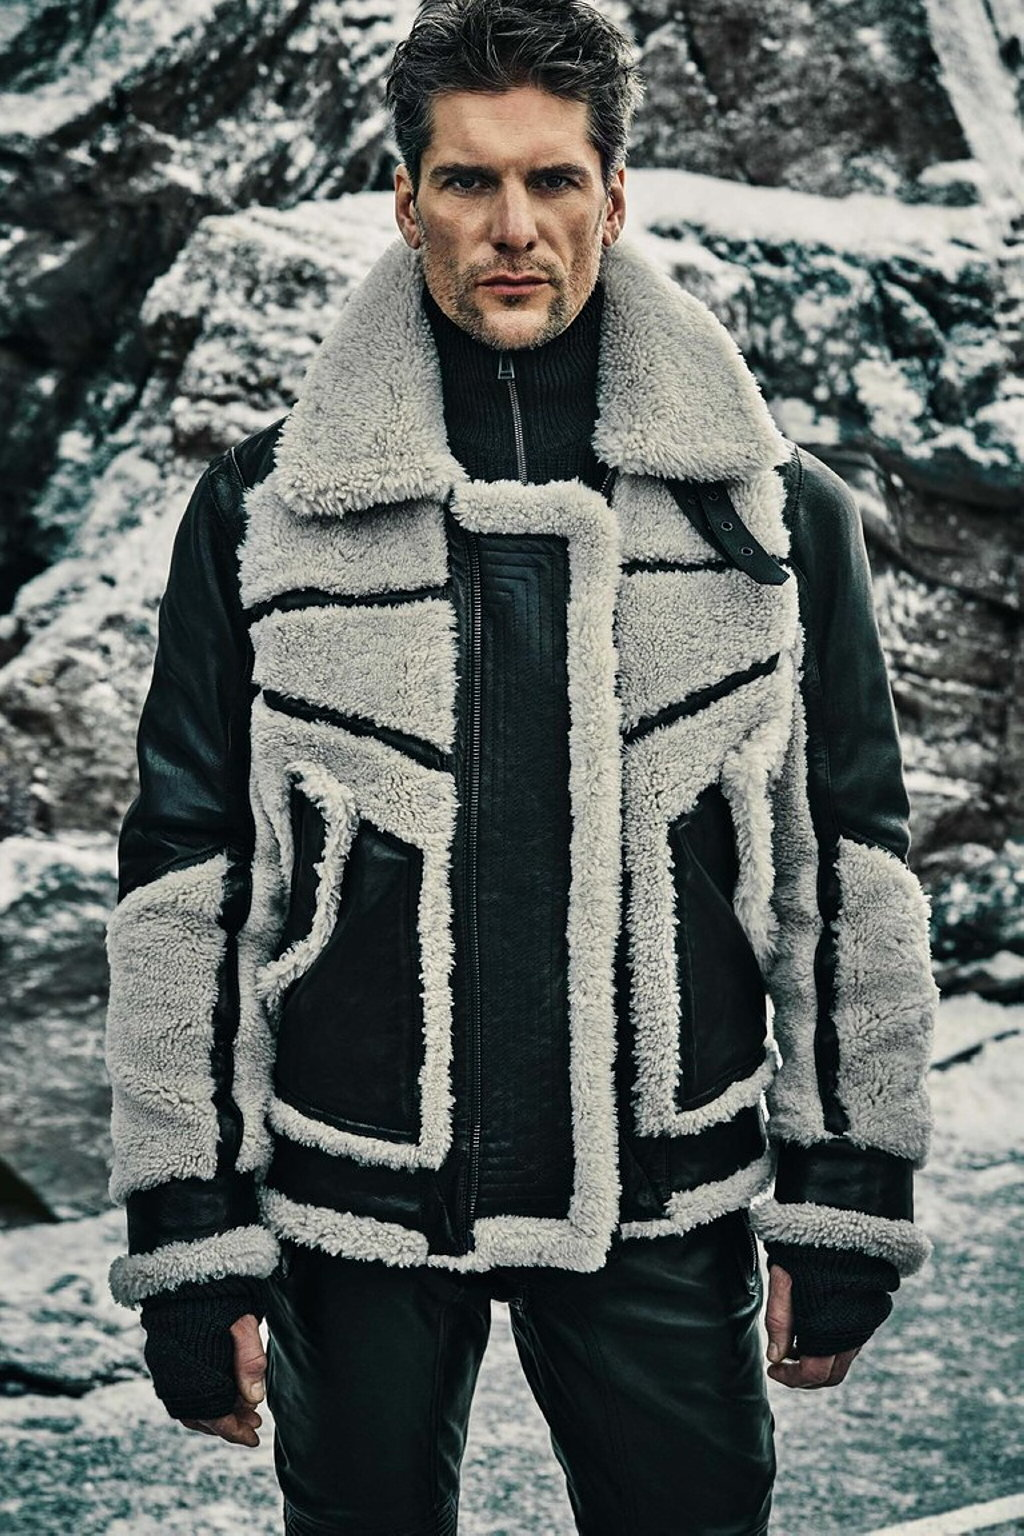 бразилию зимняя одежда для мужчин фото включала себя замену